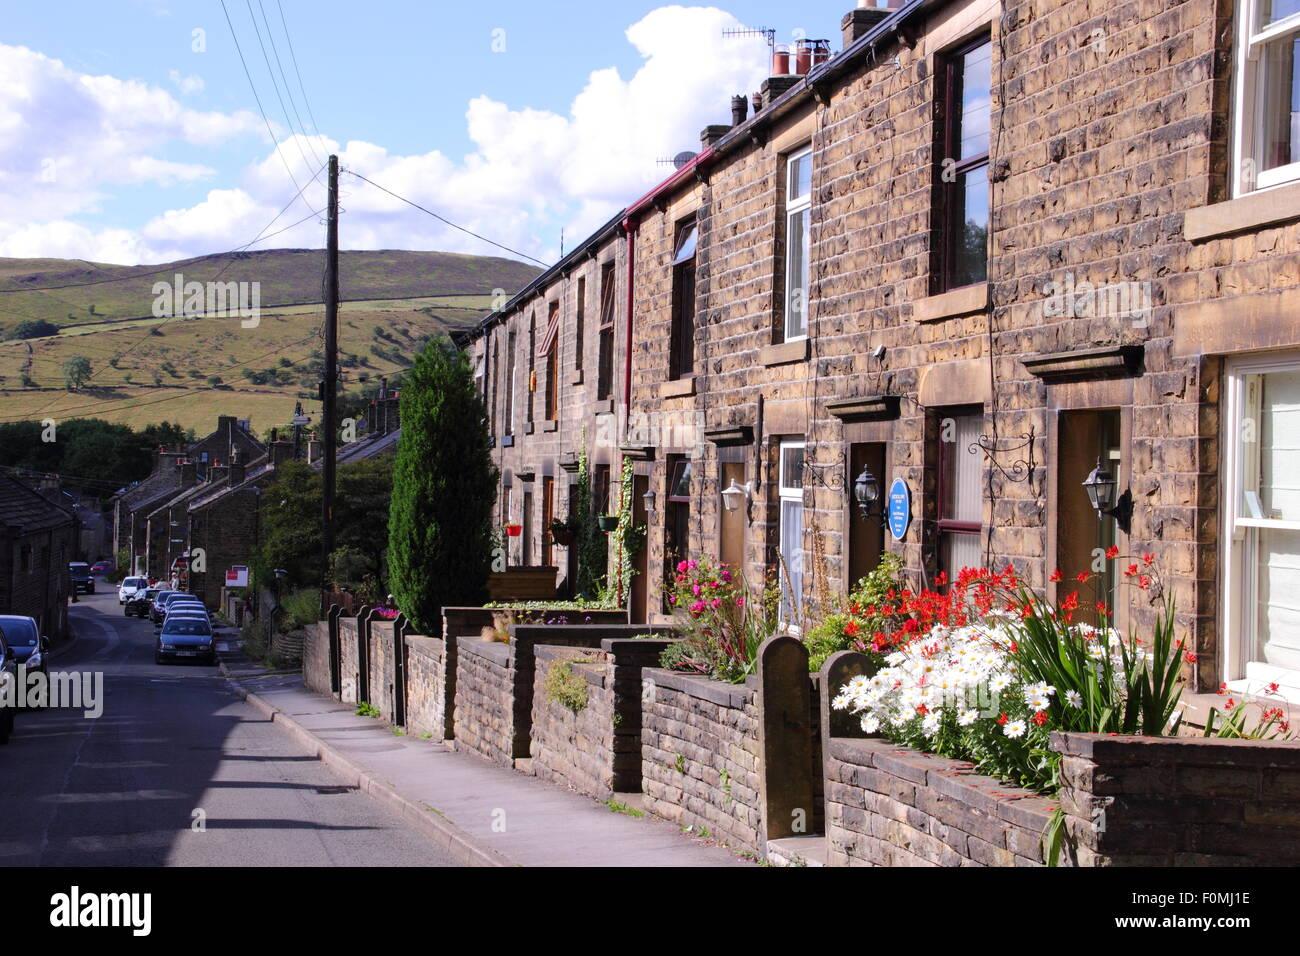 Kinder Road in Hayfield , Peak District, Derbyshire, northern England UK - Stock Image